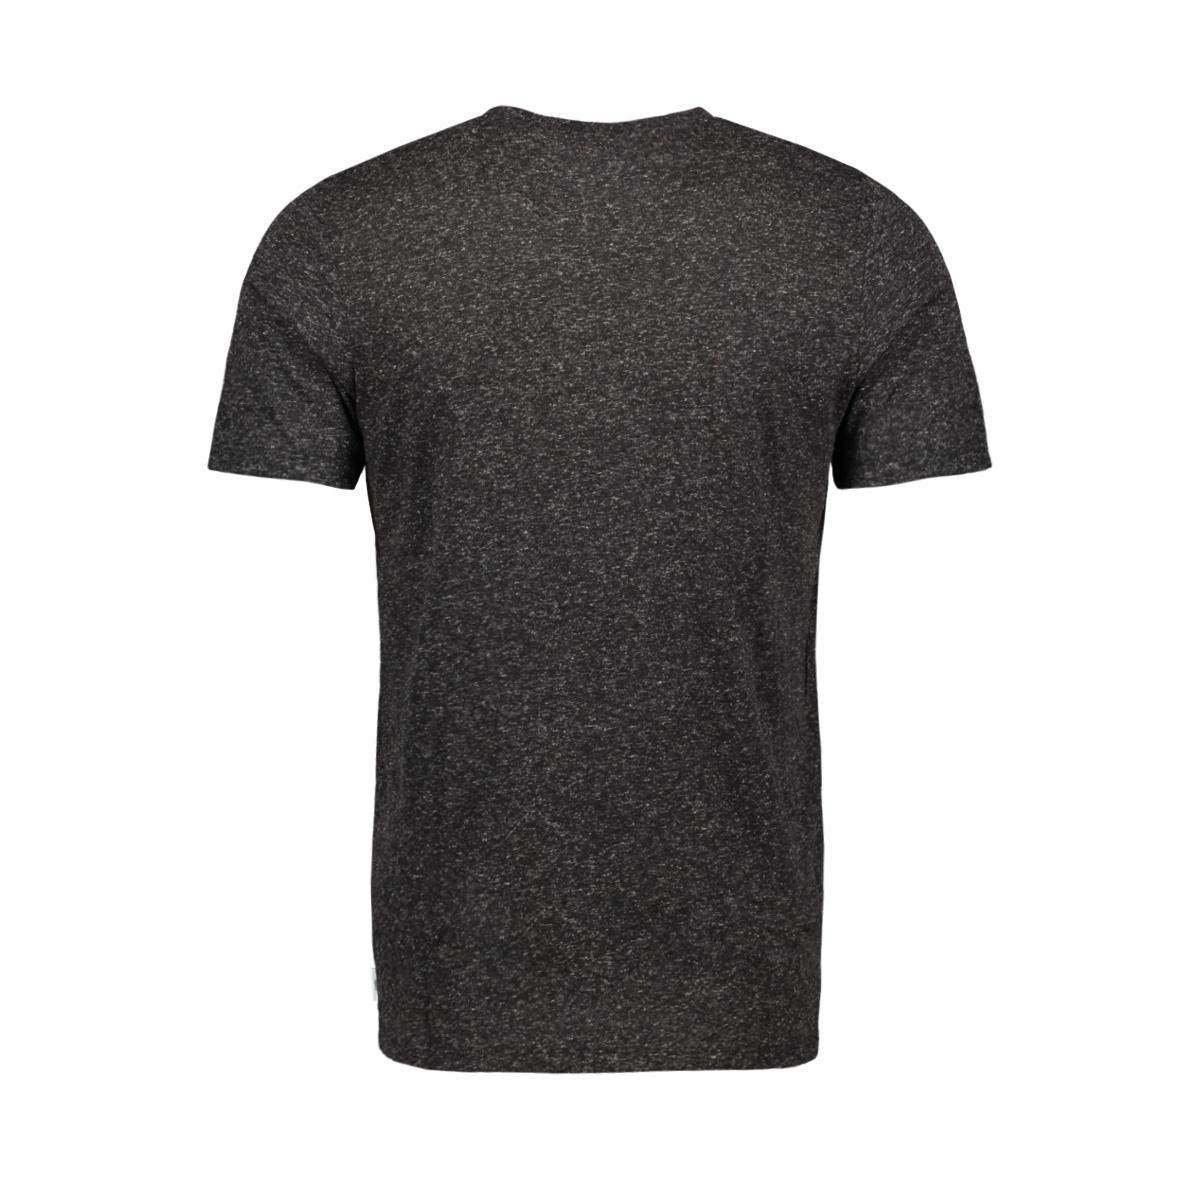 jcosimon tee ss cn 12155026 jack & jones t-shirt black/slim